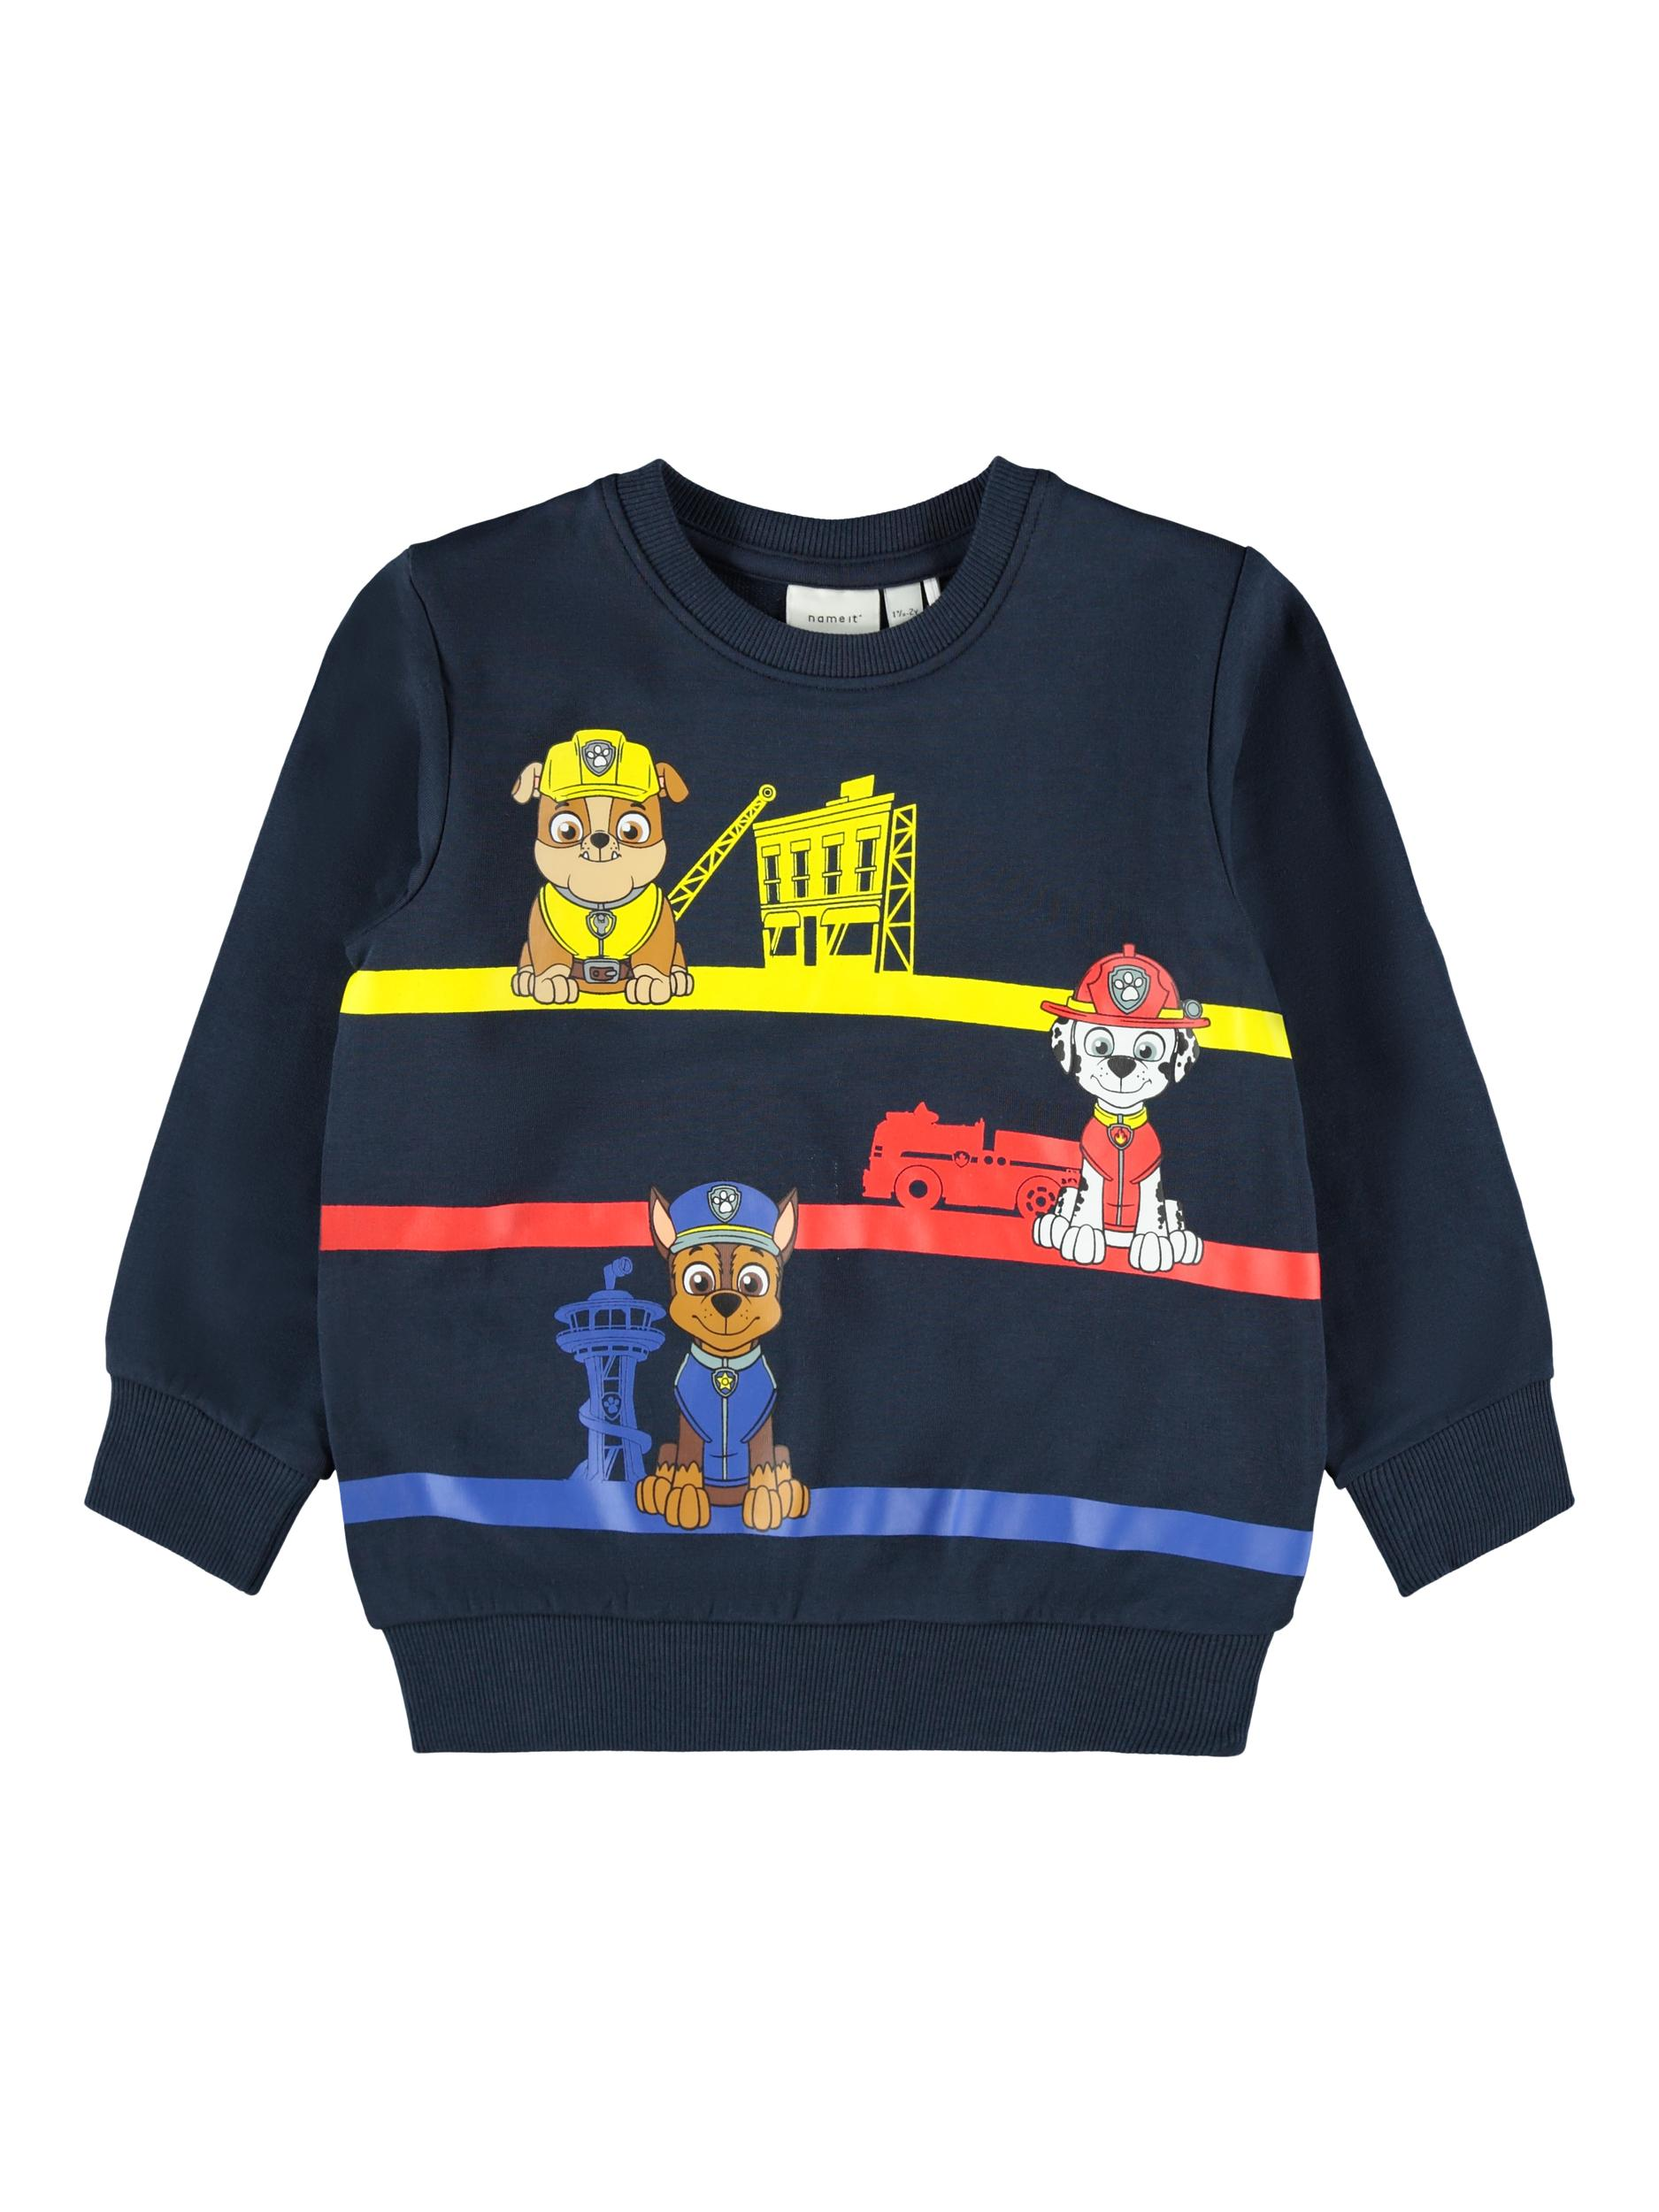 Name It Paw Patrol Enzo sweatshirt